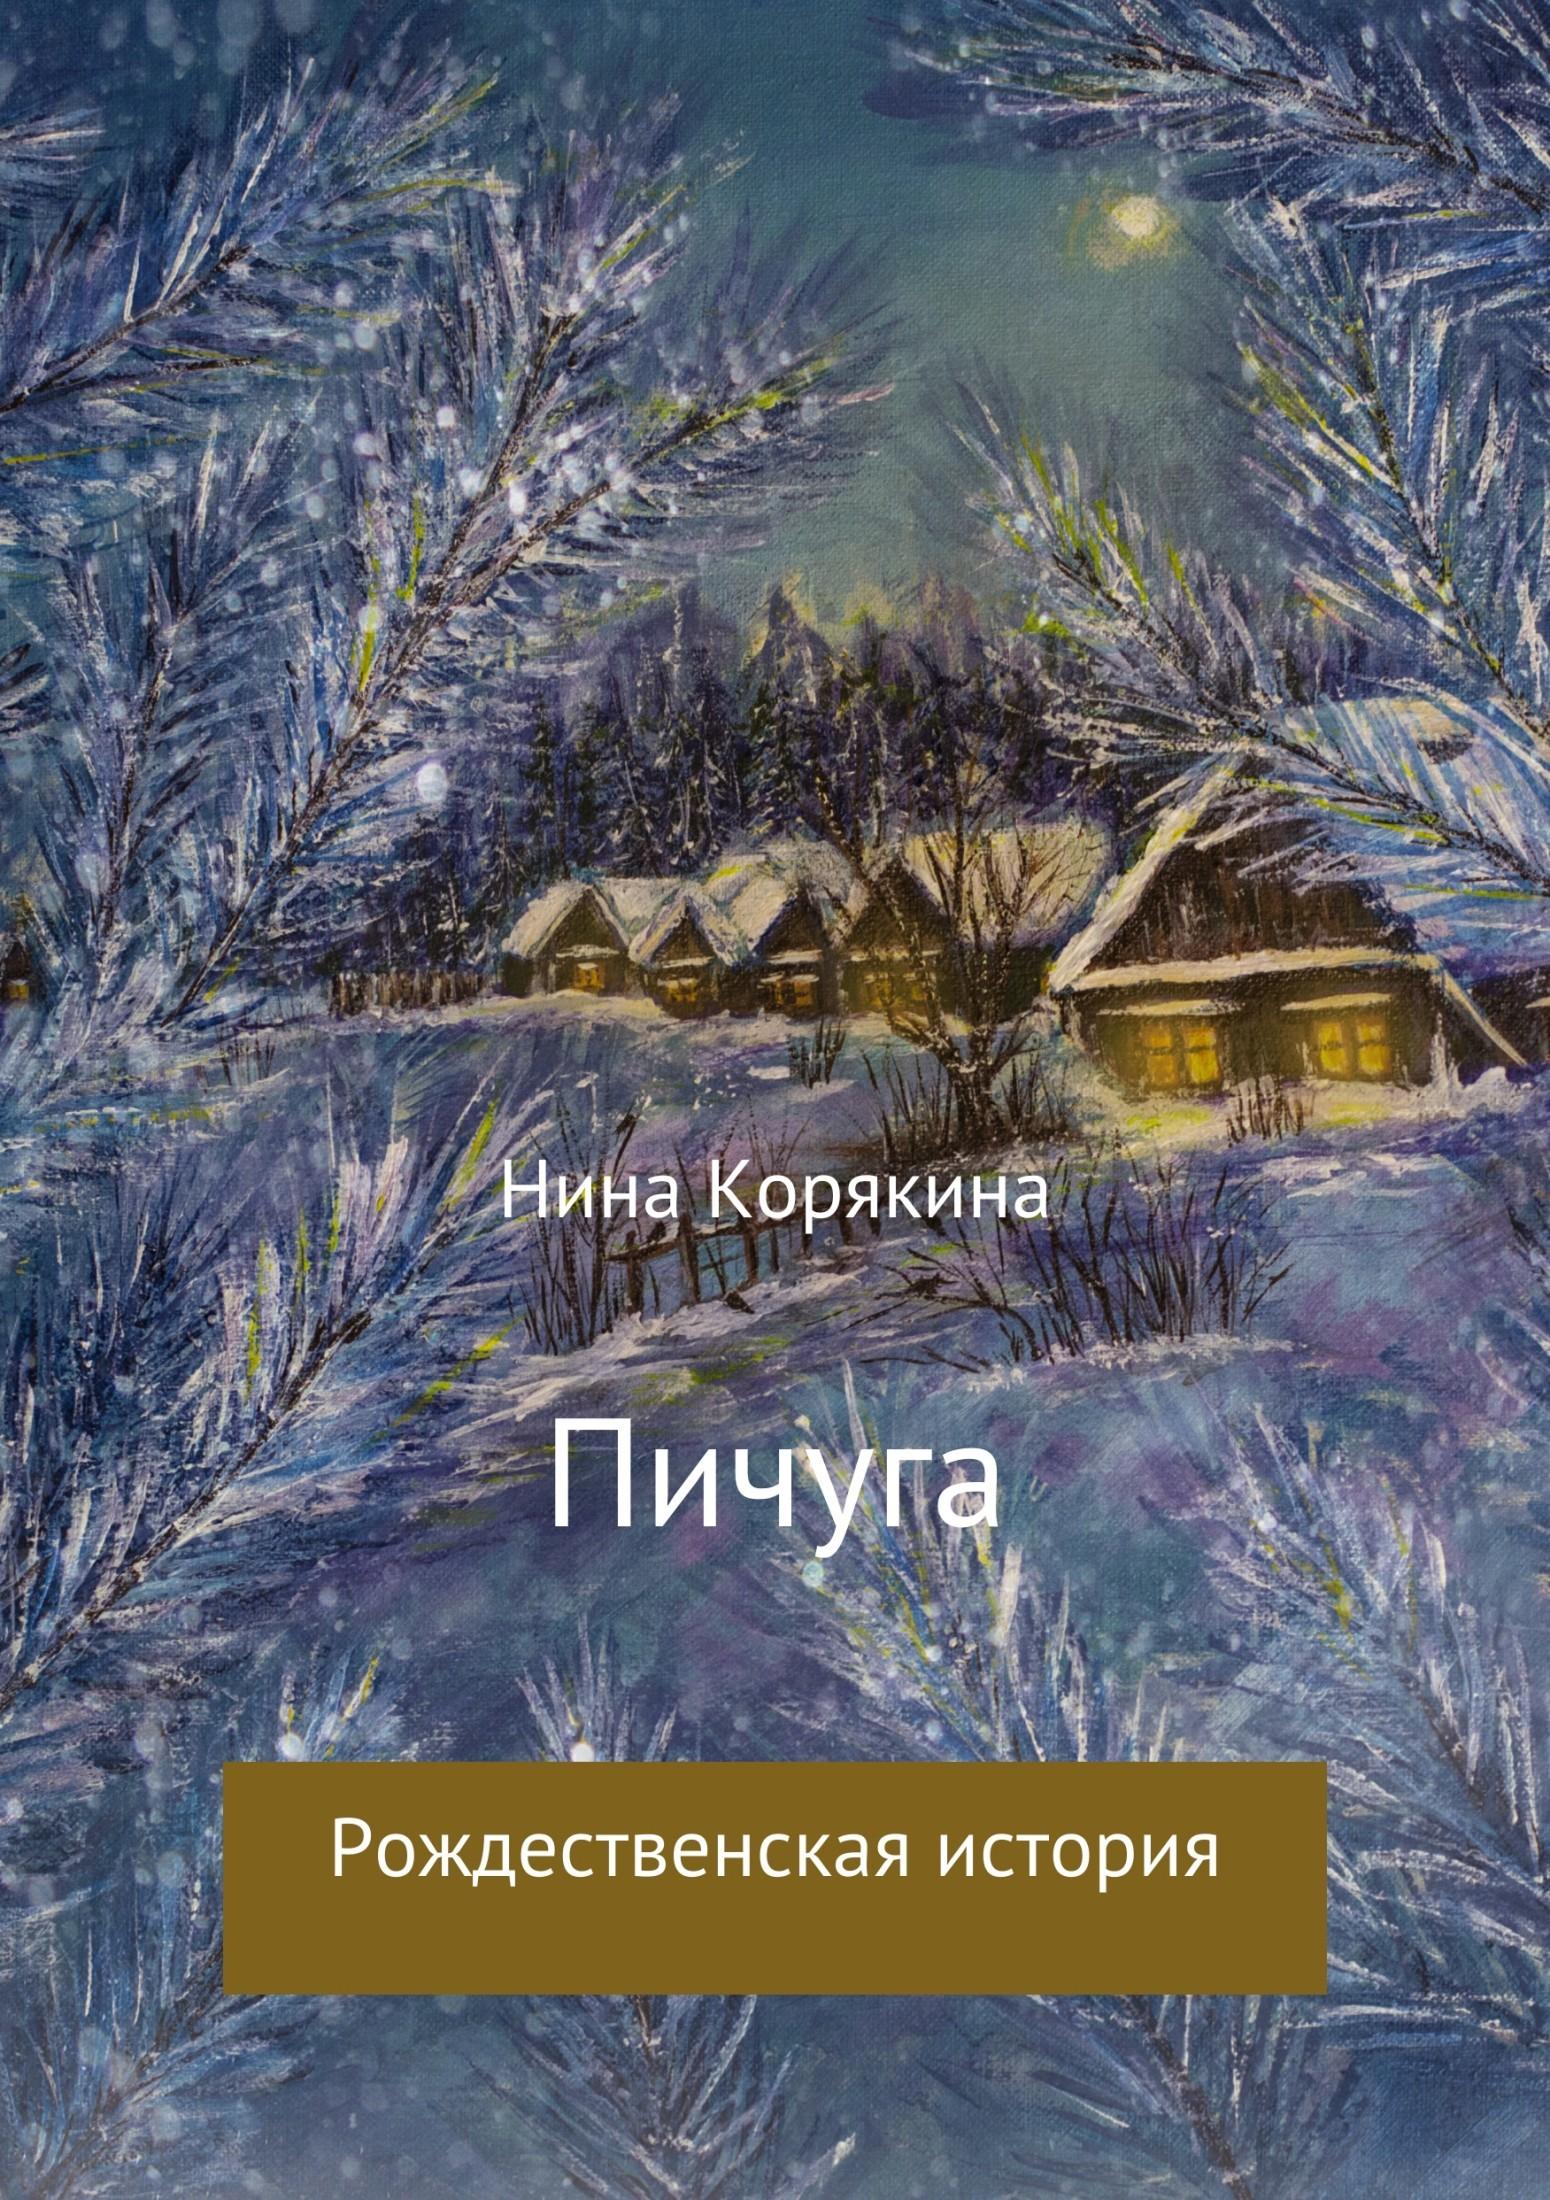 Нина Степановна Корякина. Пичуга